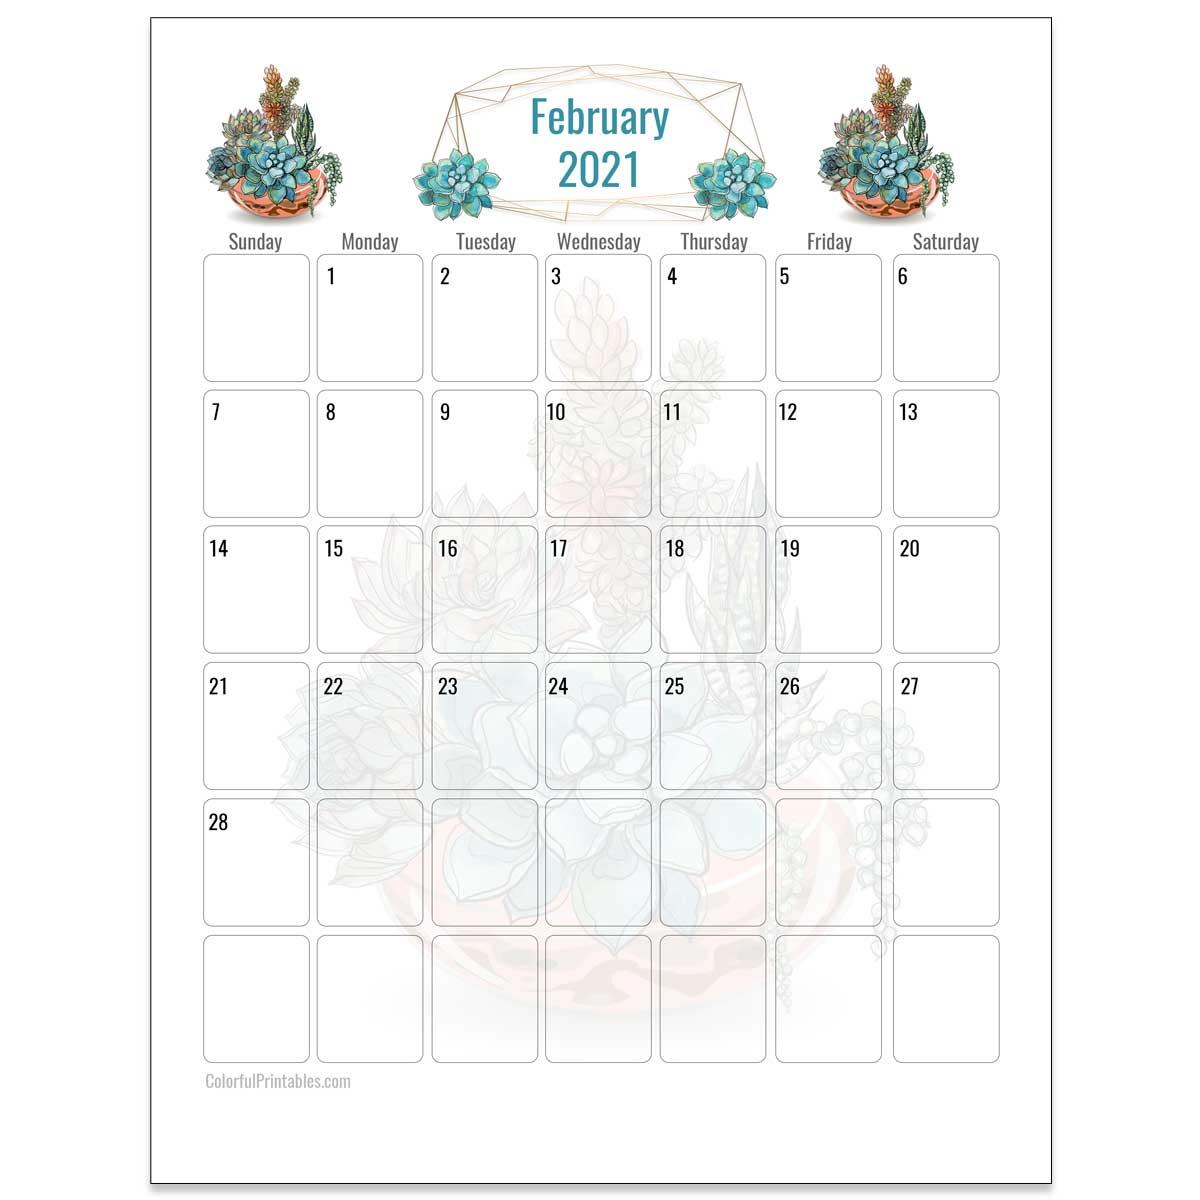 February Succulents calendar